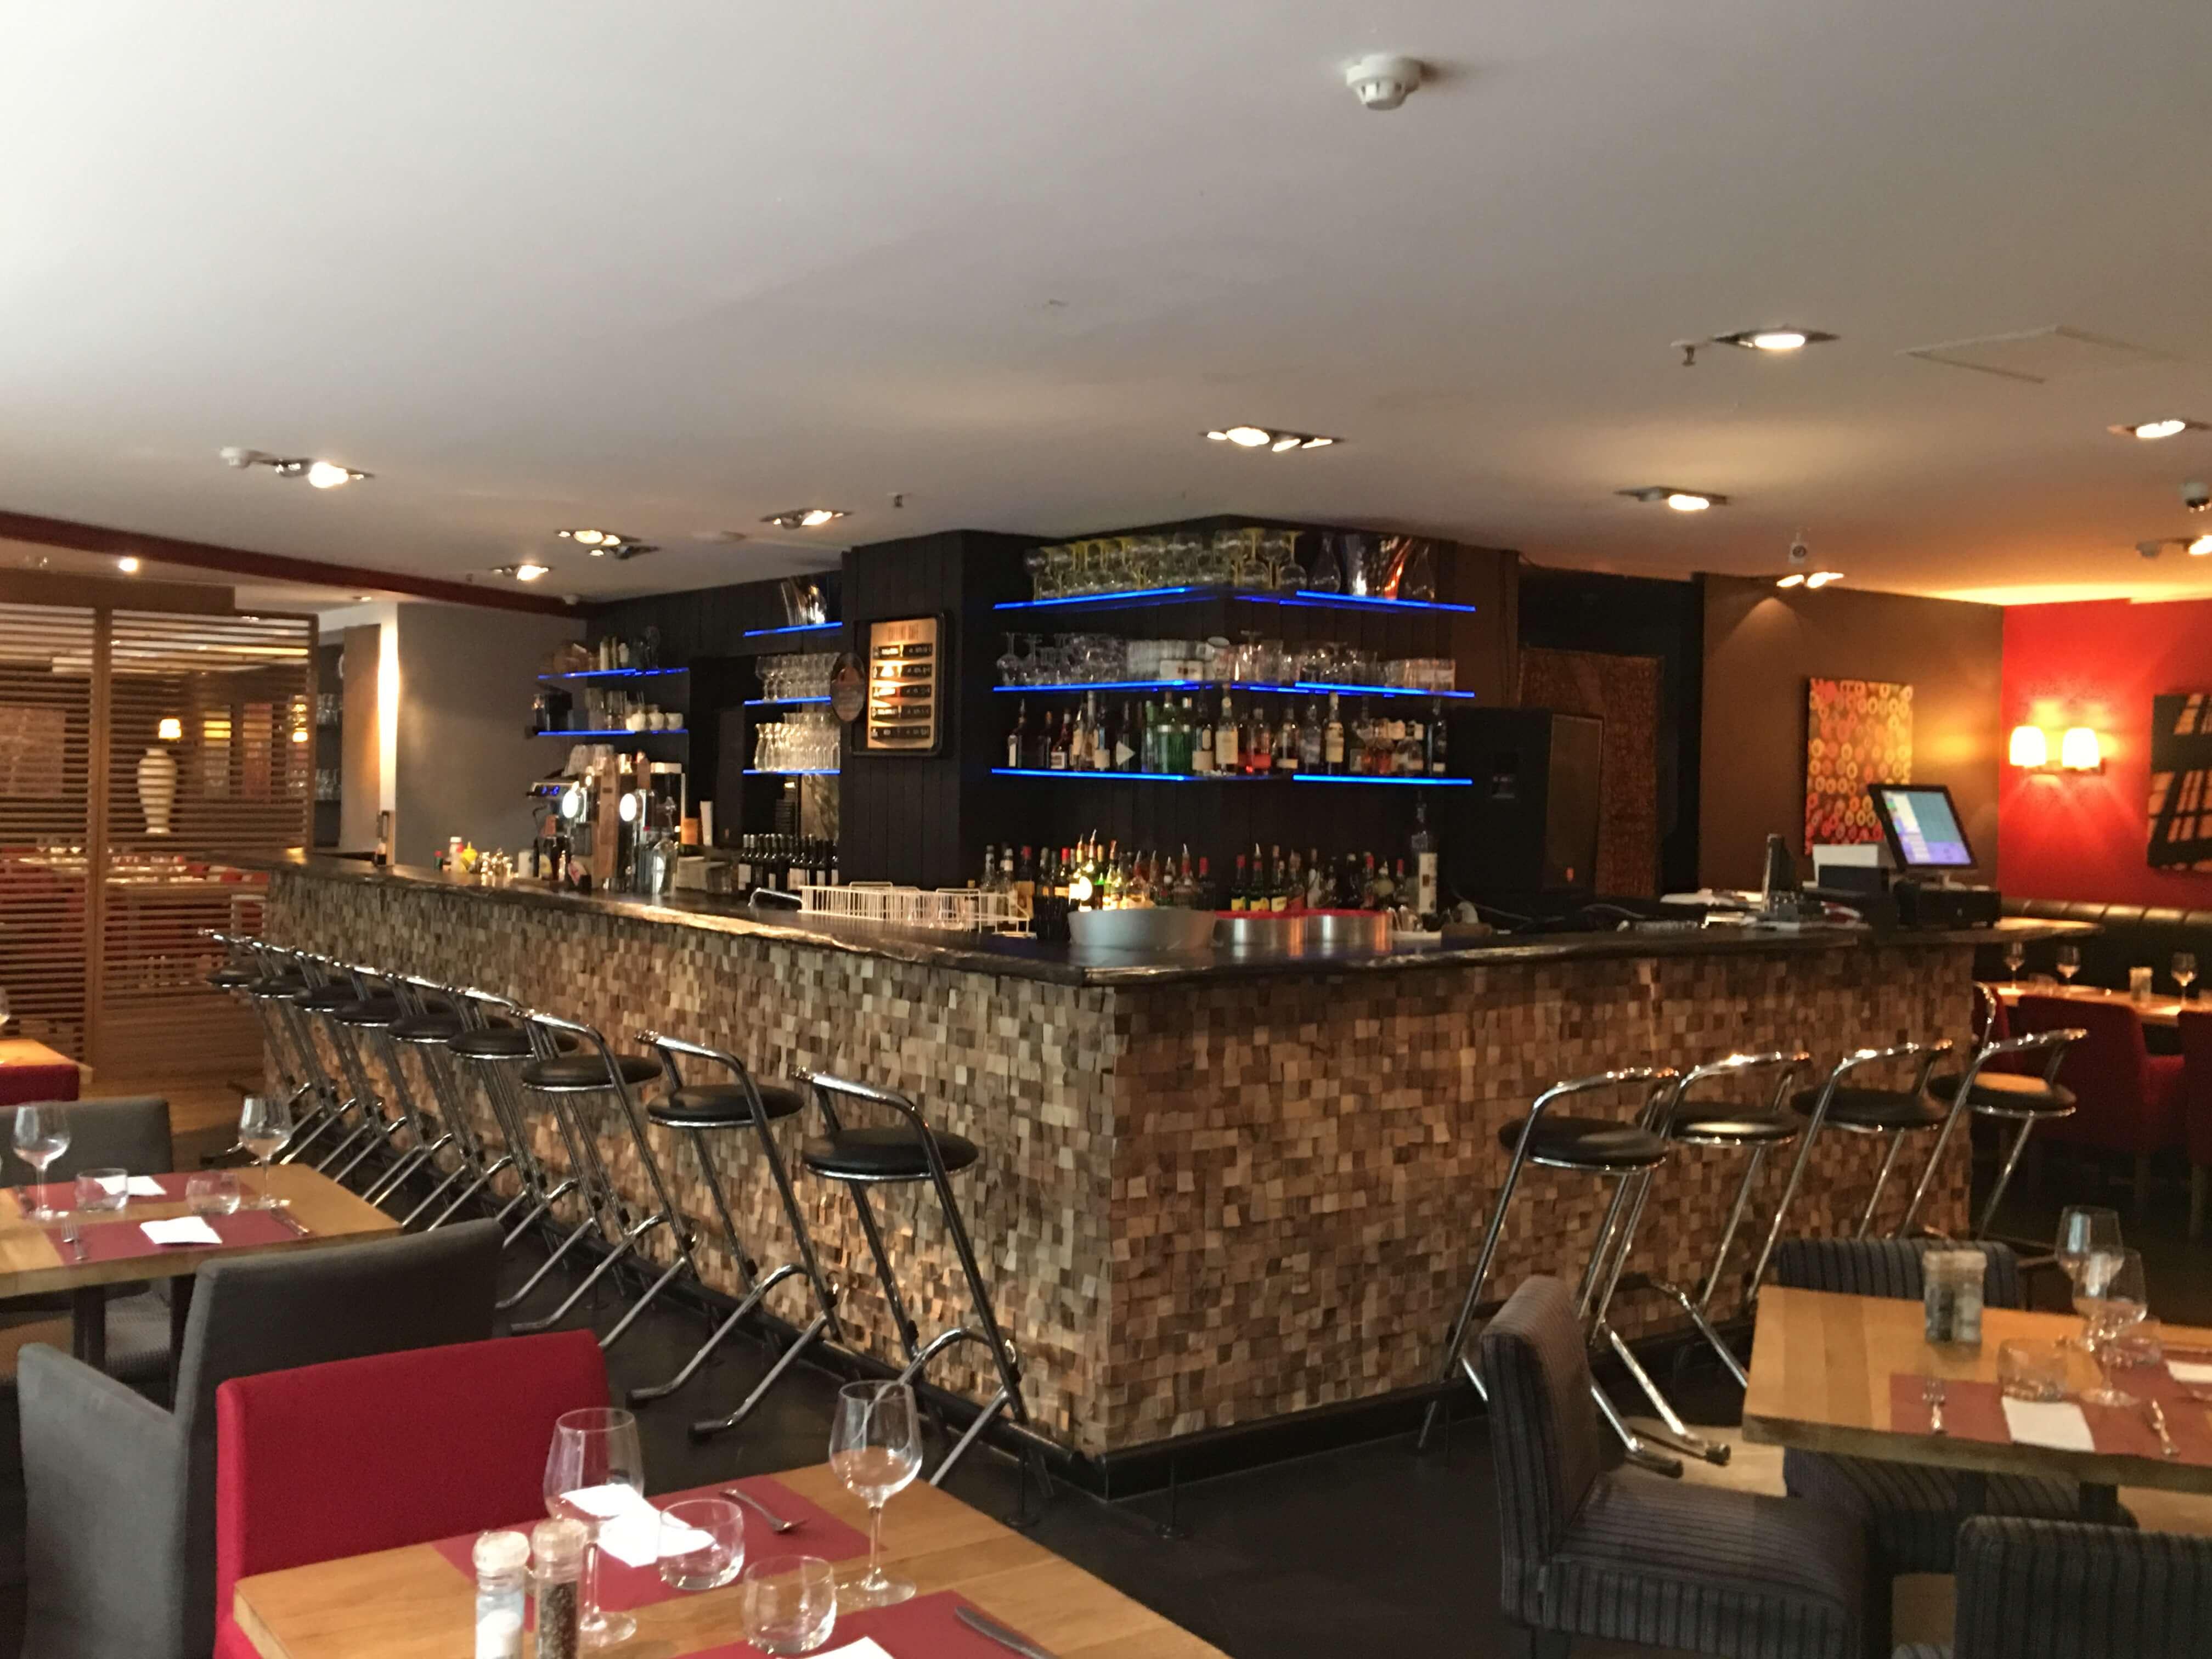 Brasserie Restaurant Callens Café – Louizalaan te Brussel helper